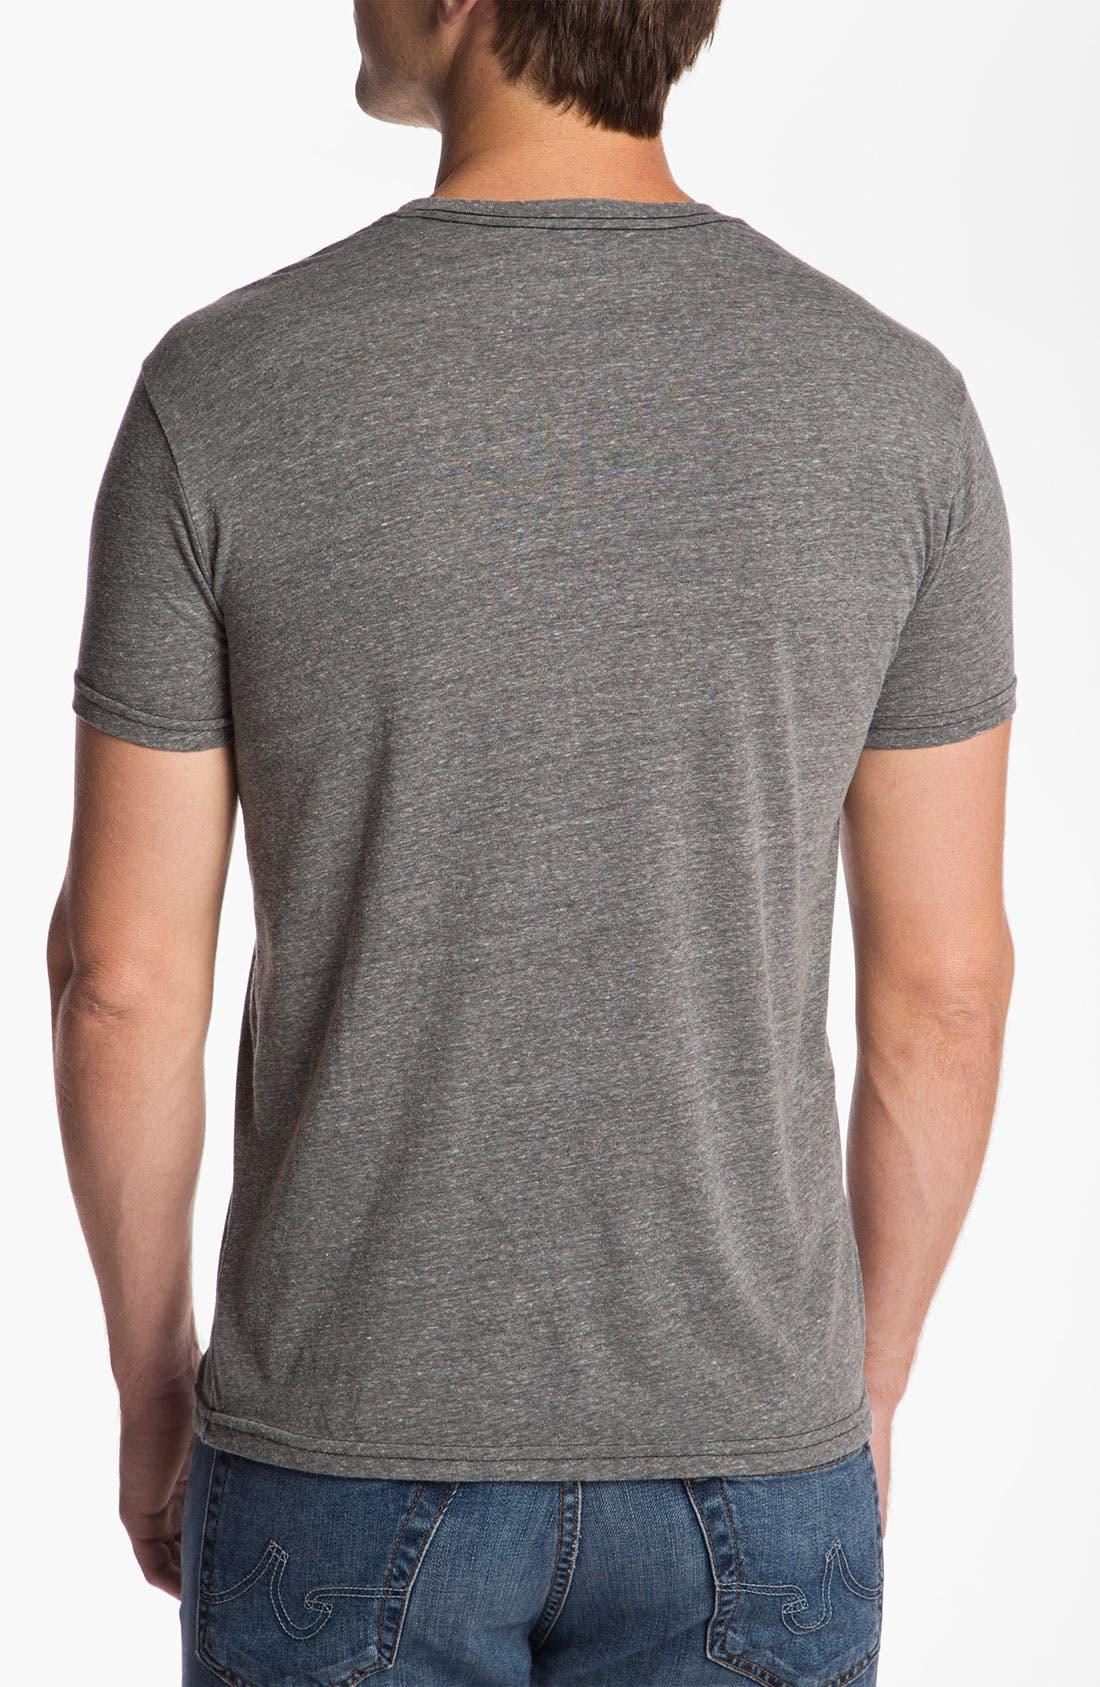 Alternate Image 2  - The Original Retro Brand 'Missouri Tigers - Stitch' T-Shirt